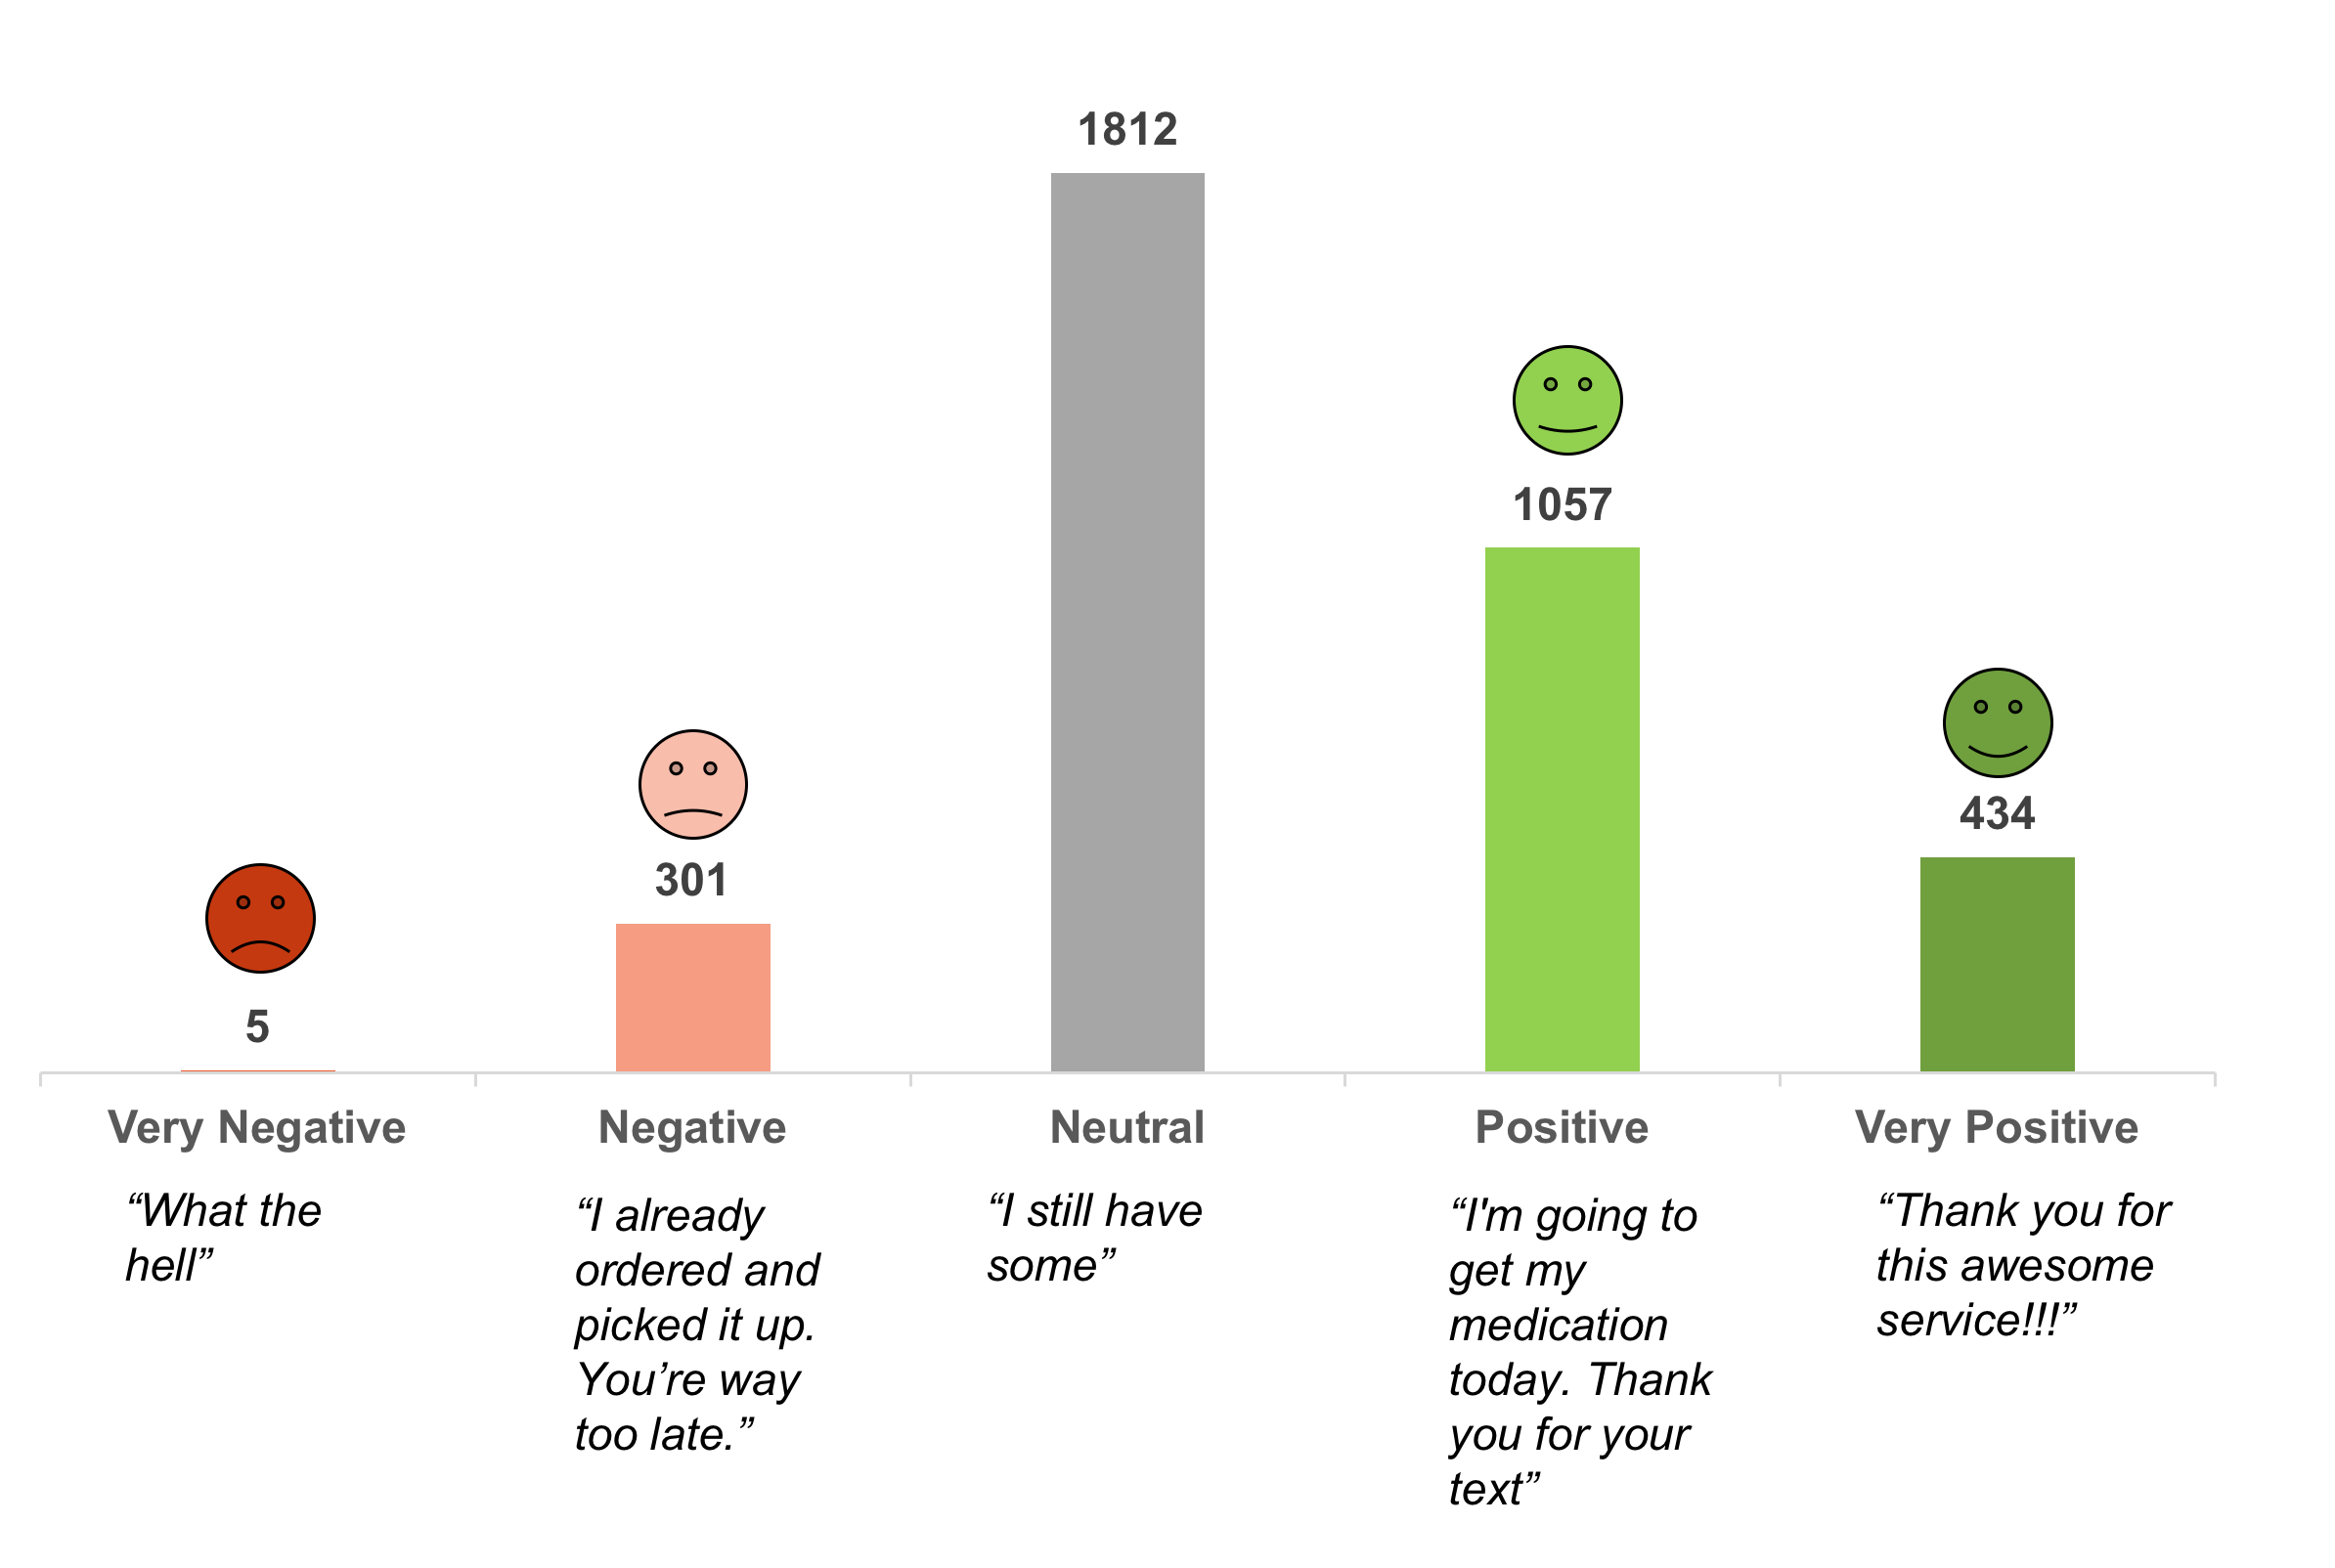 Figure 5. Sentiment in patient responses.